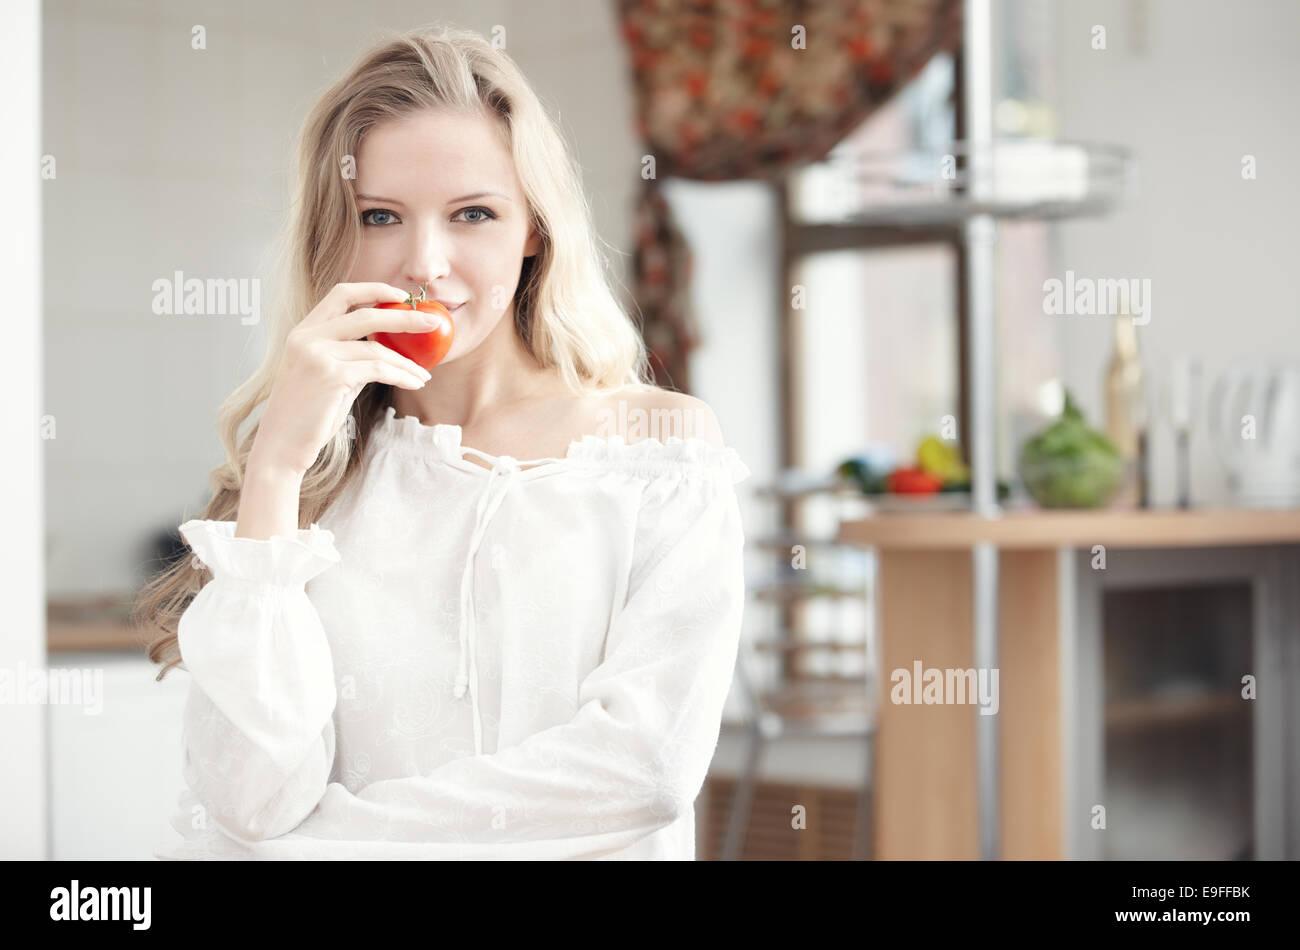 Dietary - Stock Image